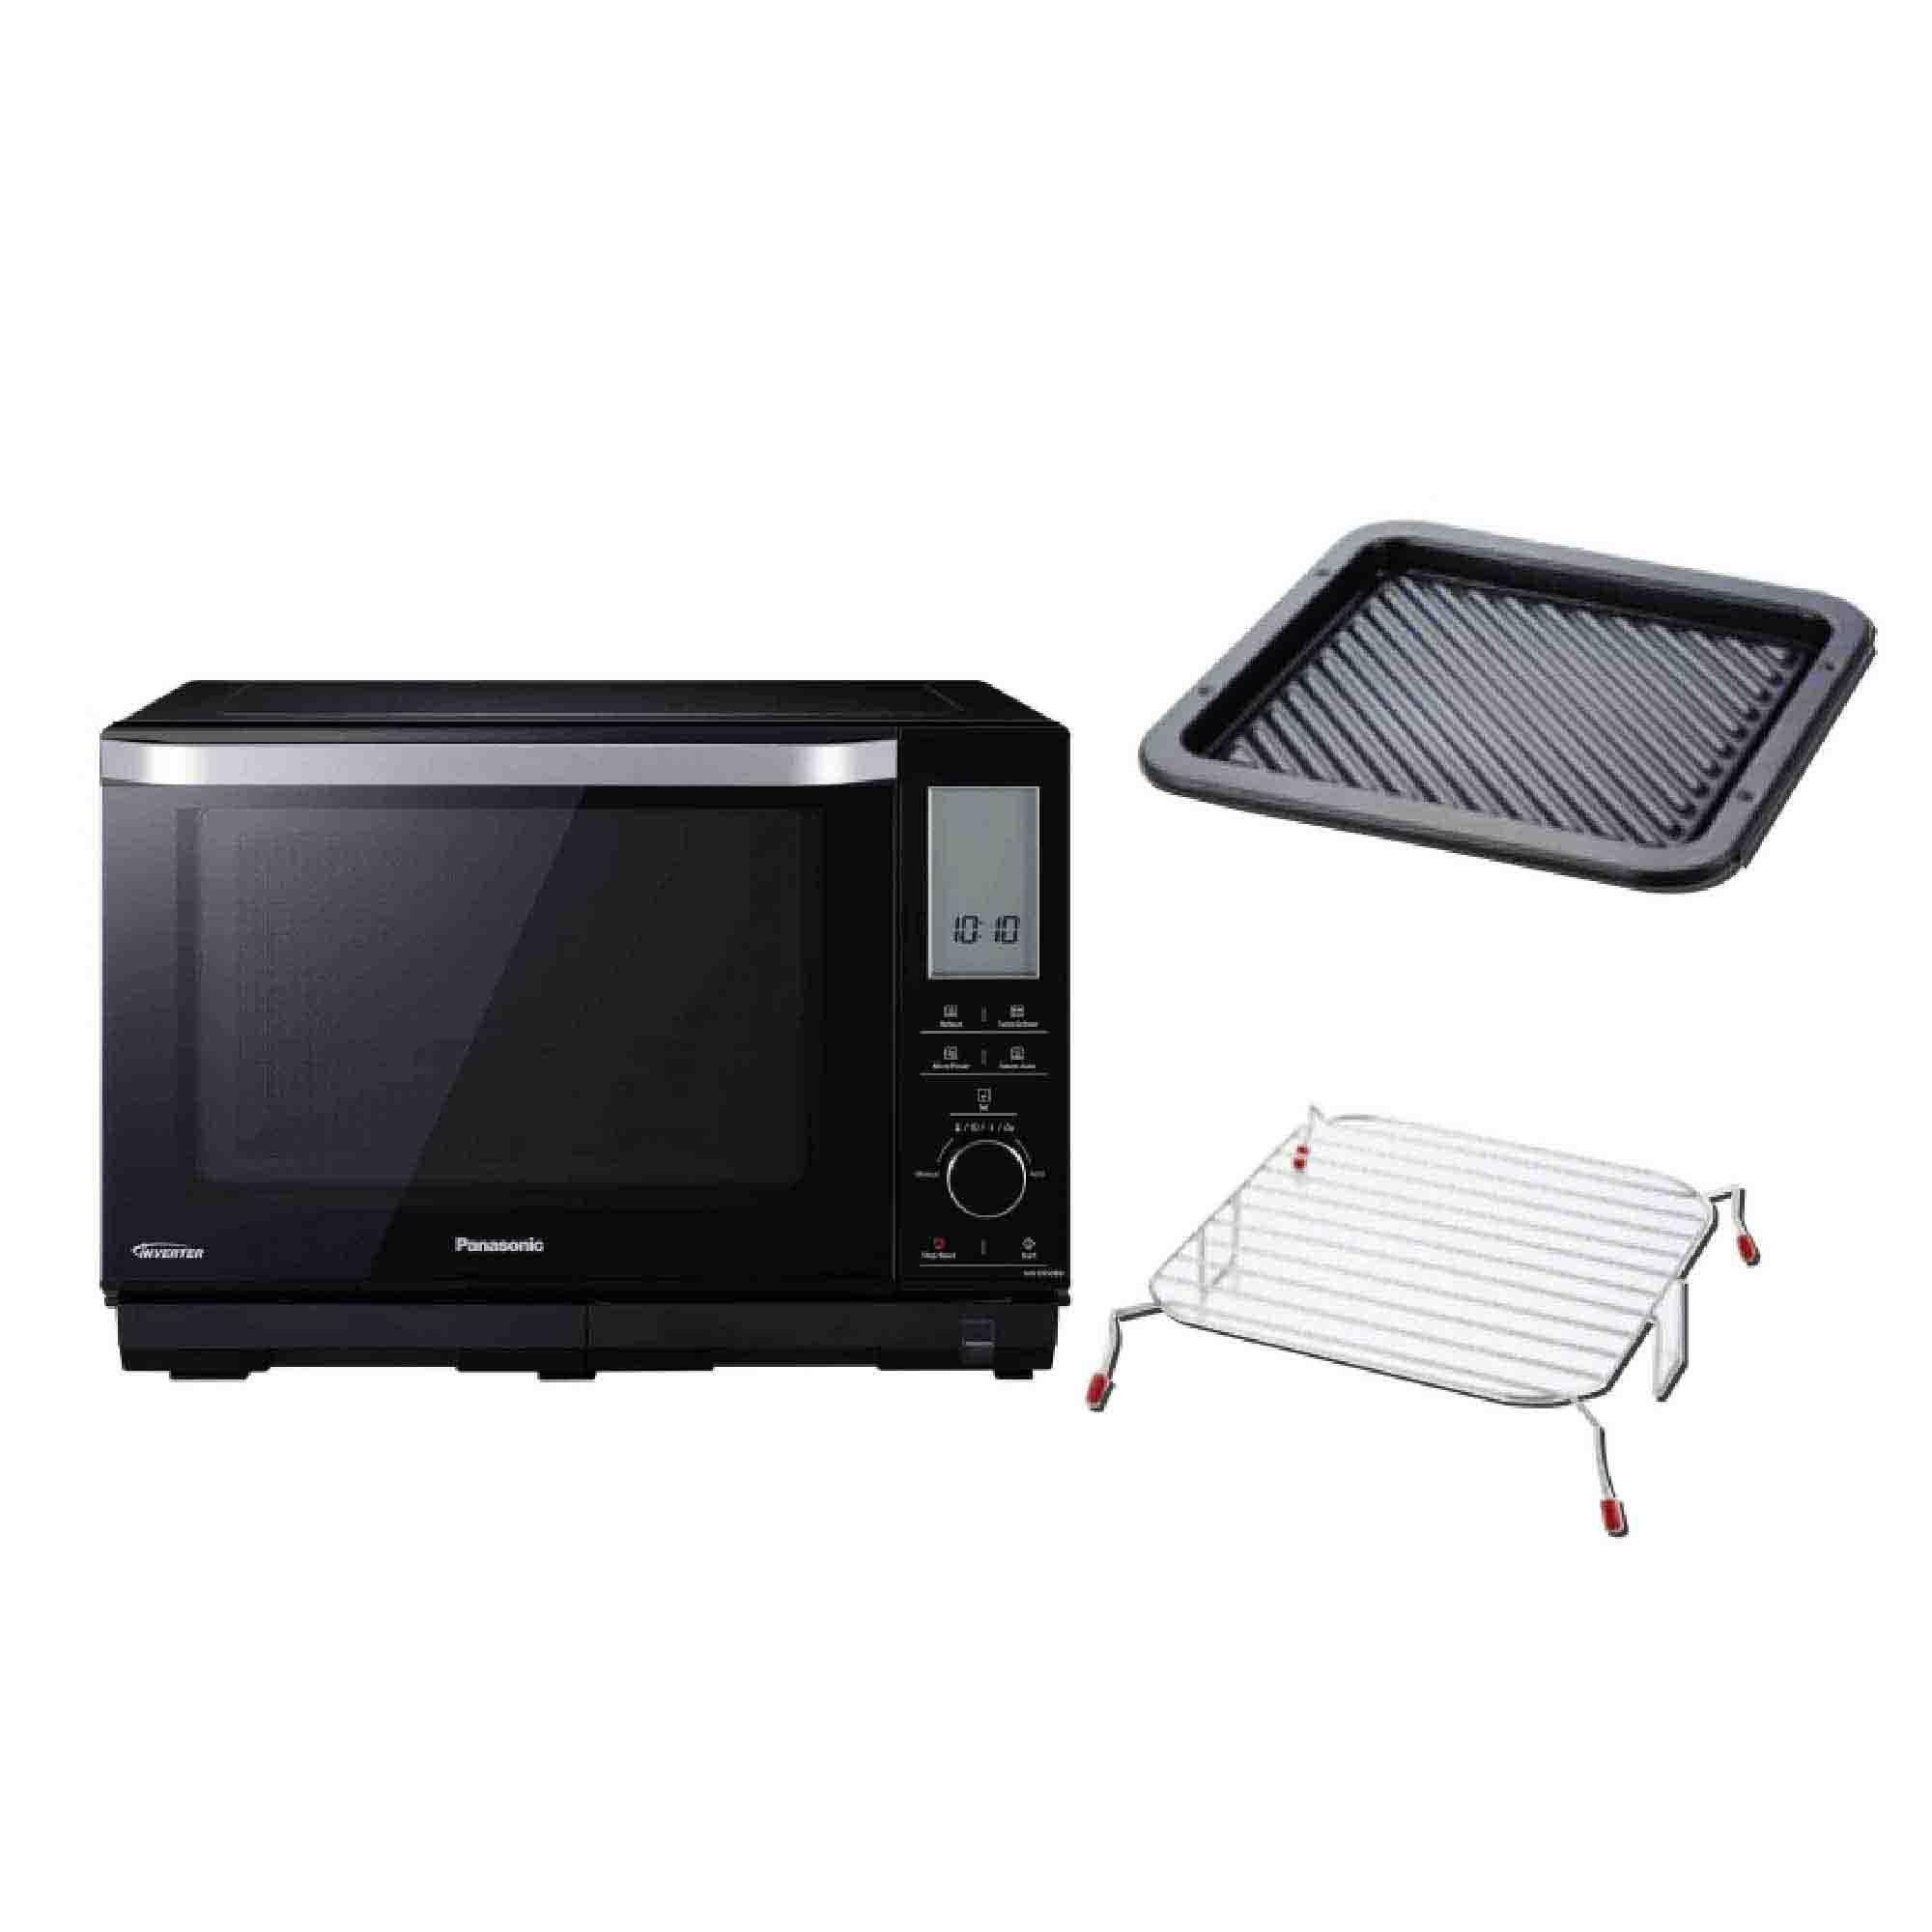 Panasonic Microwave Steam Oven Bestmicrowave